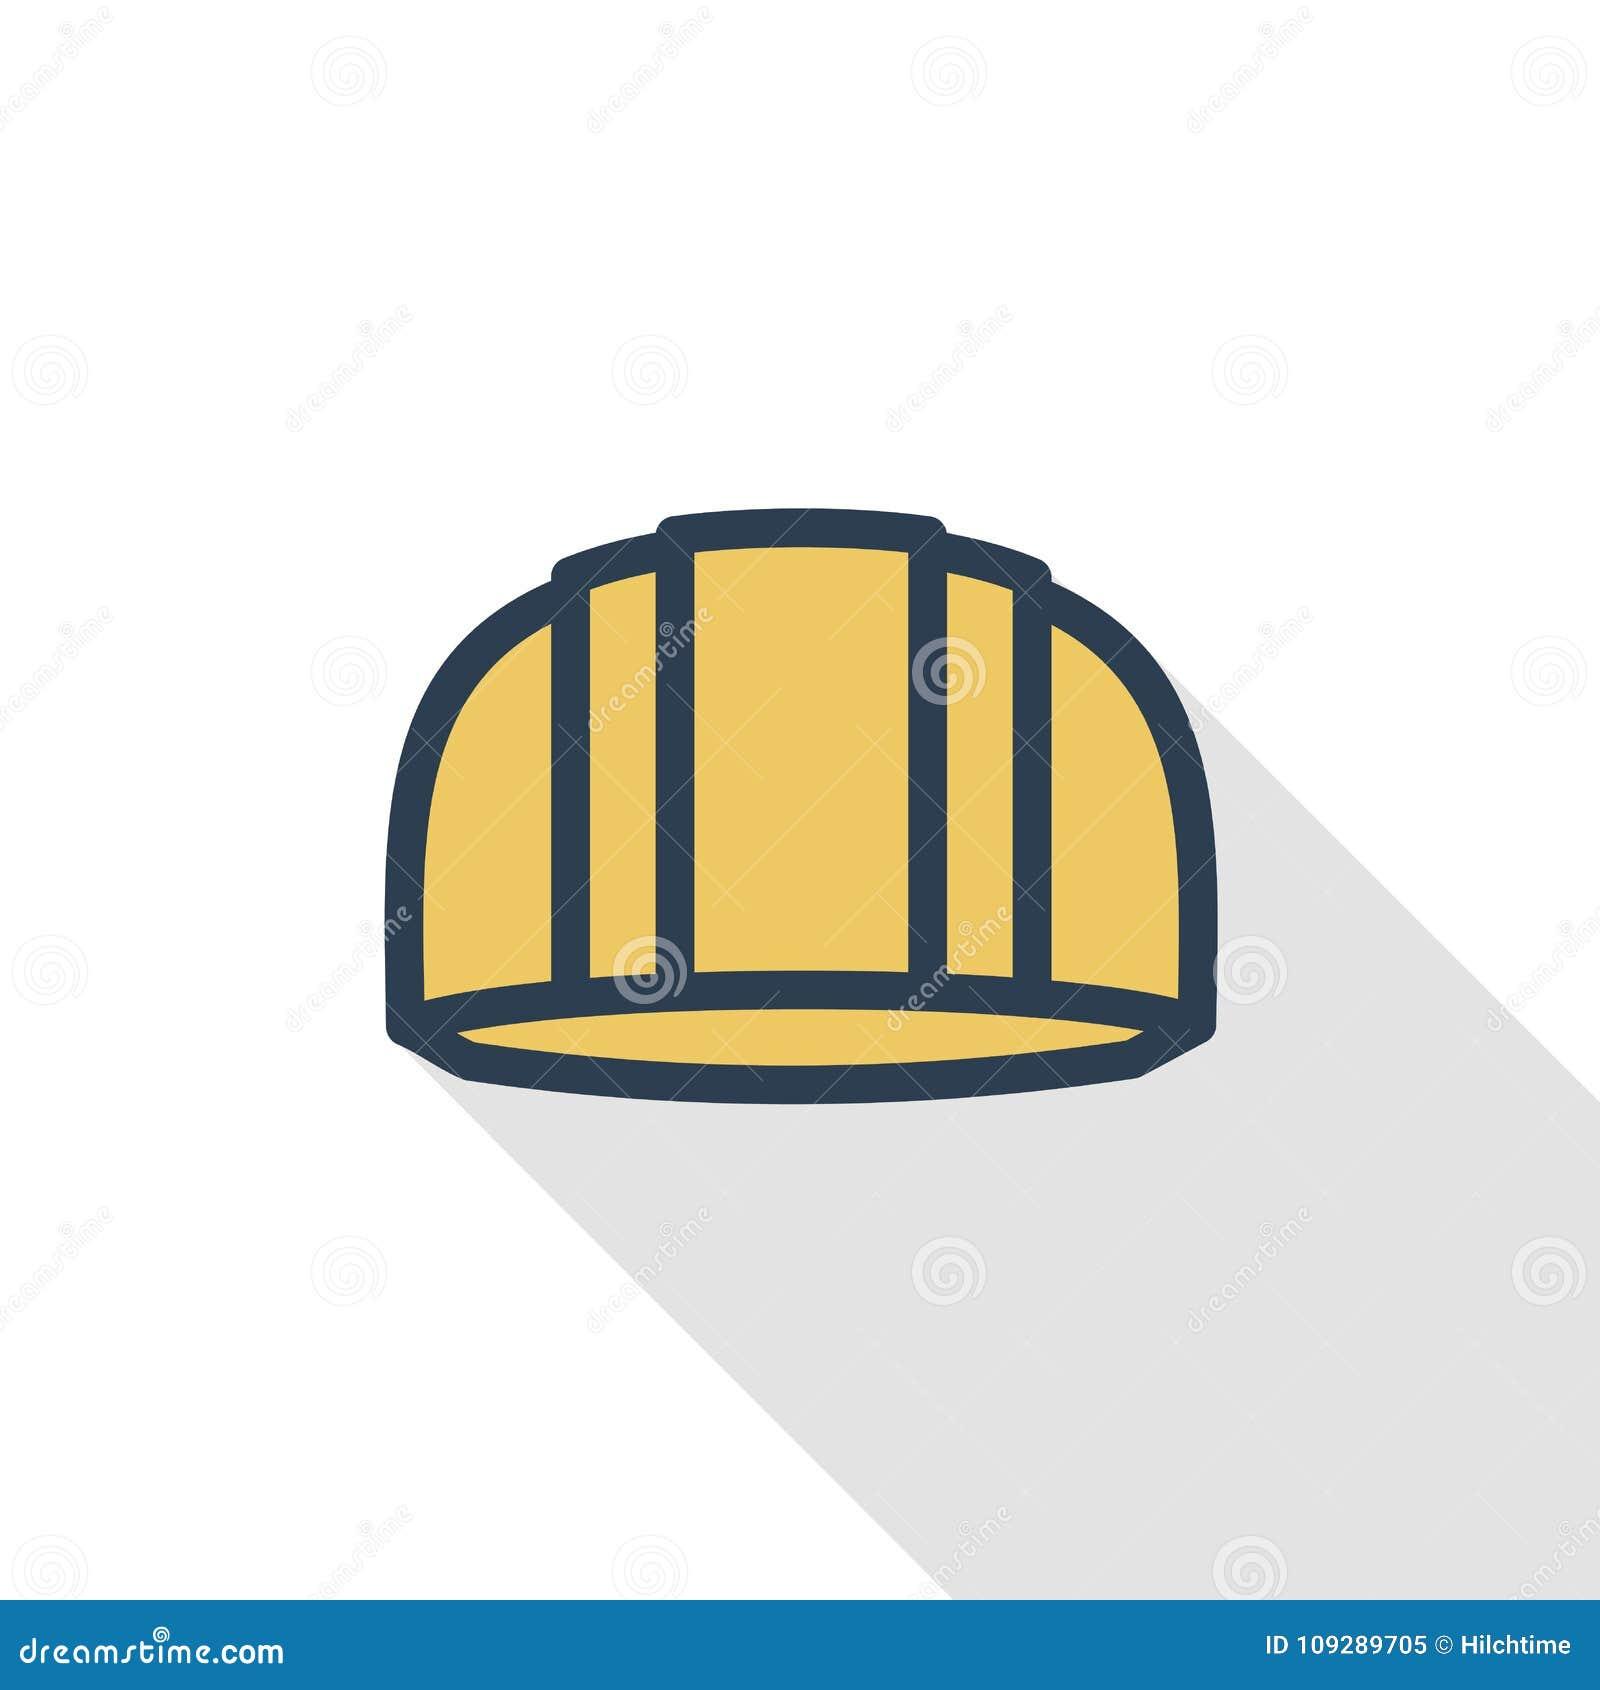 Construction symbol, helmet thin line flat color icon. Linear vector symbol. Colorful long shadow design.